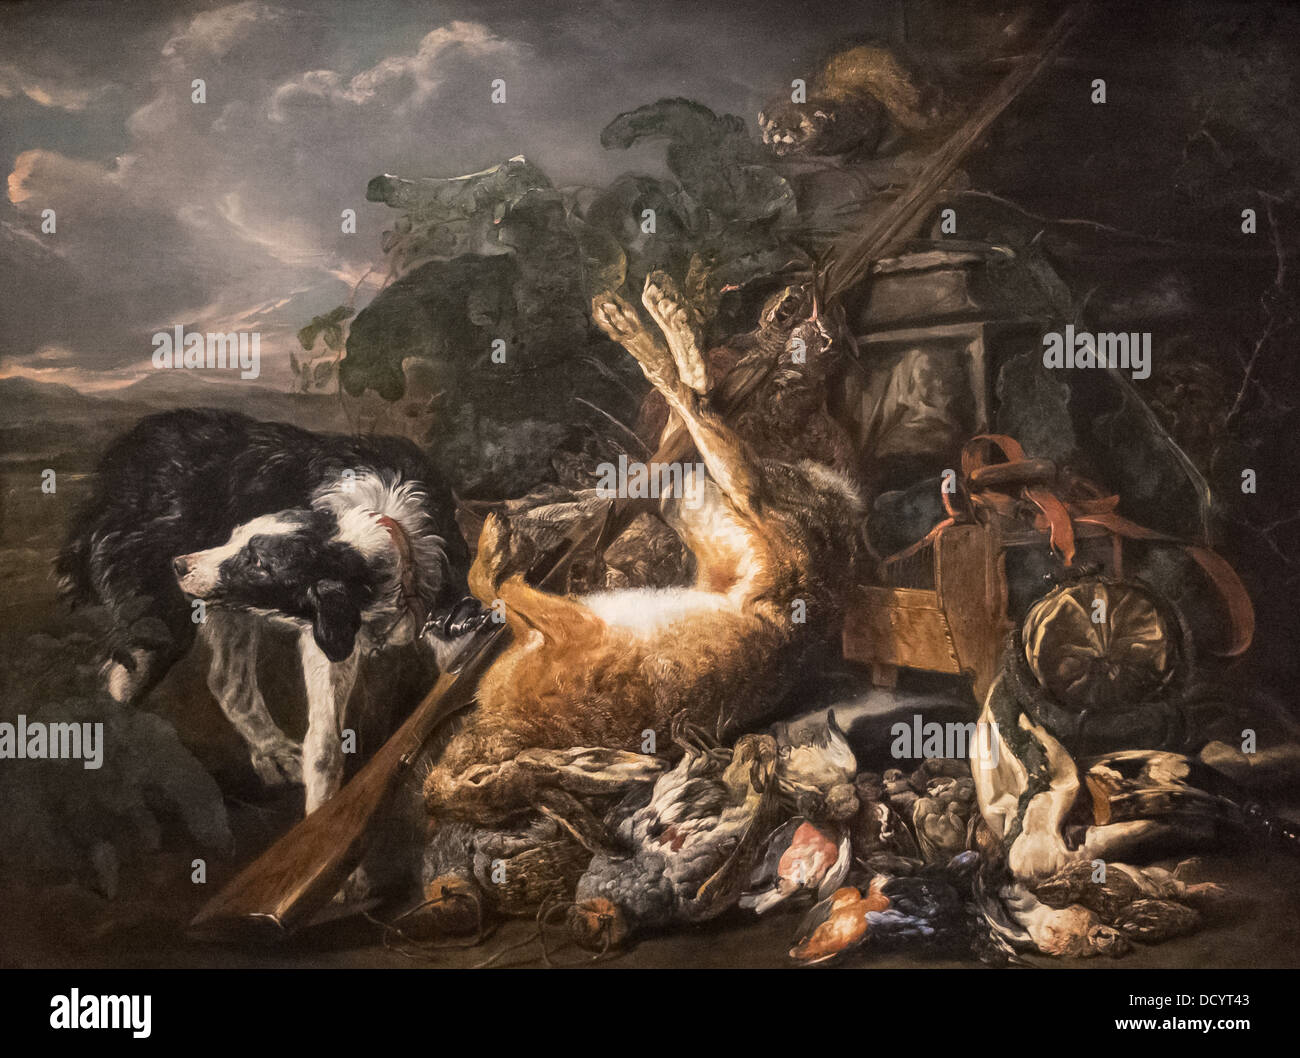 Siglo XVIII - Bodegón de caza - Jean Fyta (1755) - DeYoung Museum - San Francisco Óleo sobre lienzo Imagen De Stock